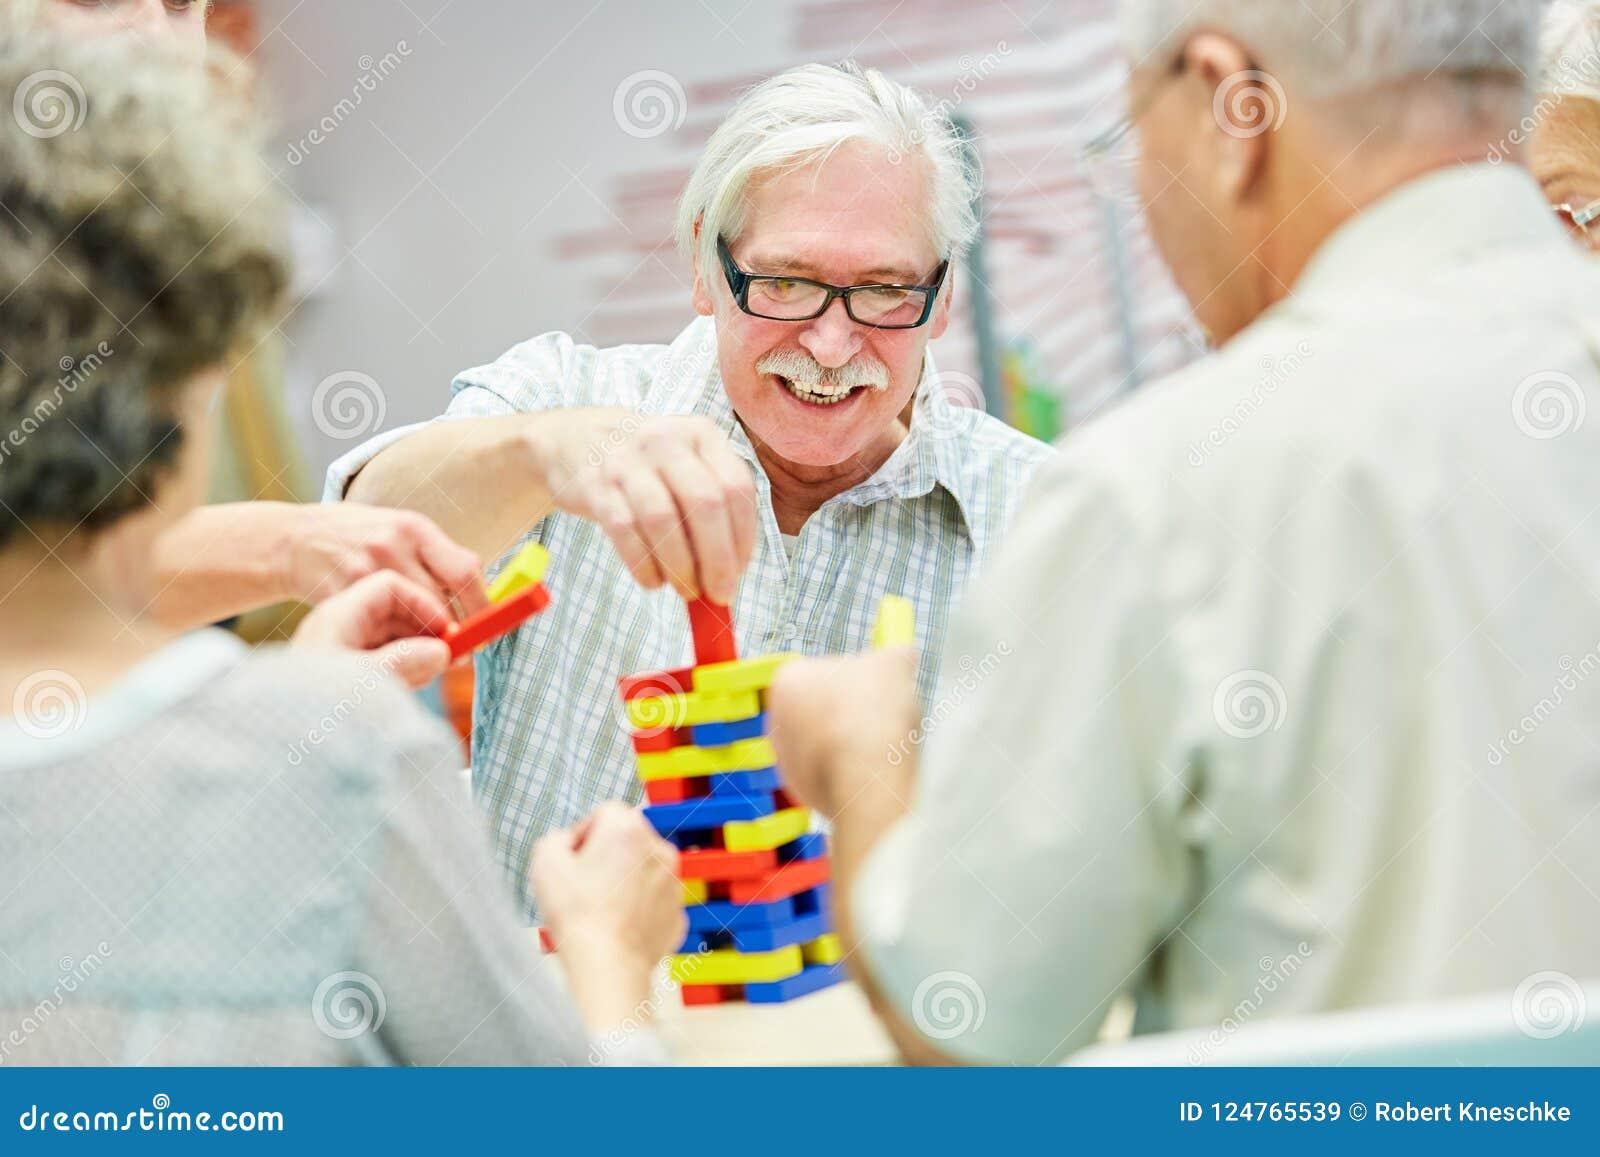 Demensgruppen i avgånghem spelar med byggnadskvarter